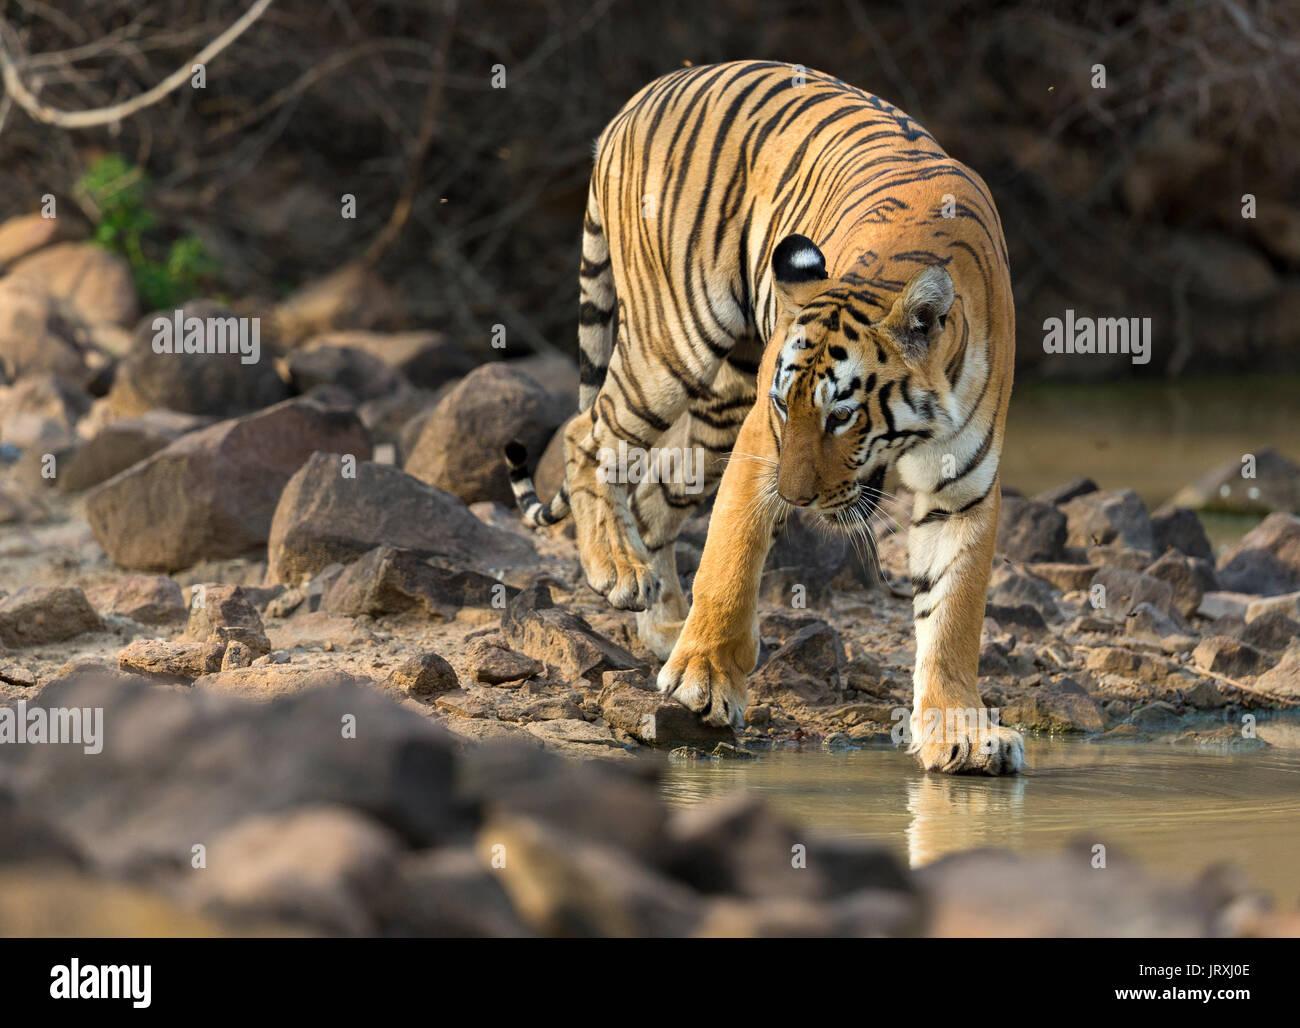 Royal Bengal Tiger or Panthera tigris tigris or Indian Tiger near the water in Tadoba National park, Maharashtra - Stock Image